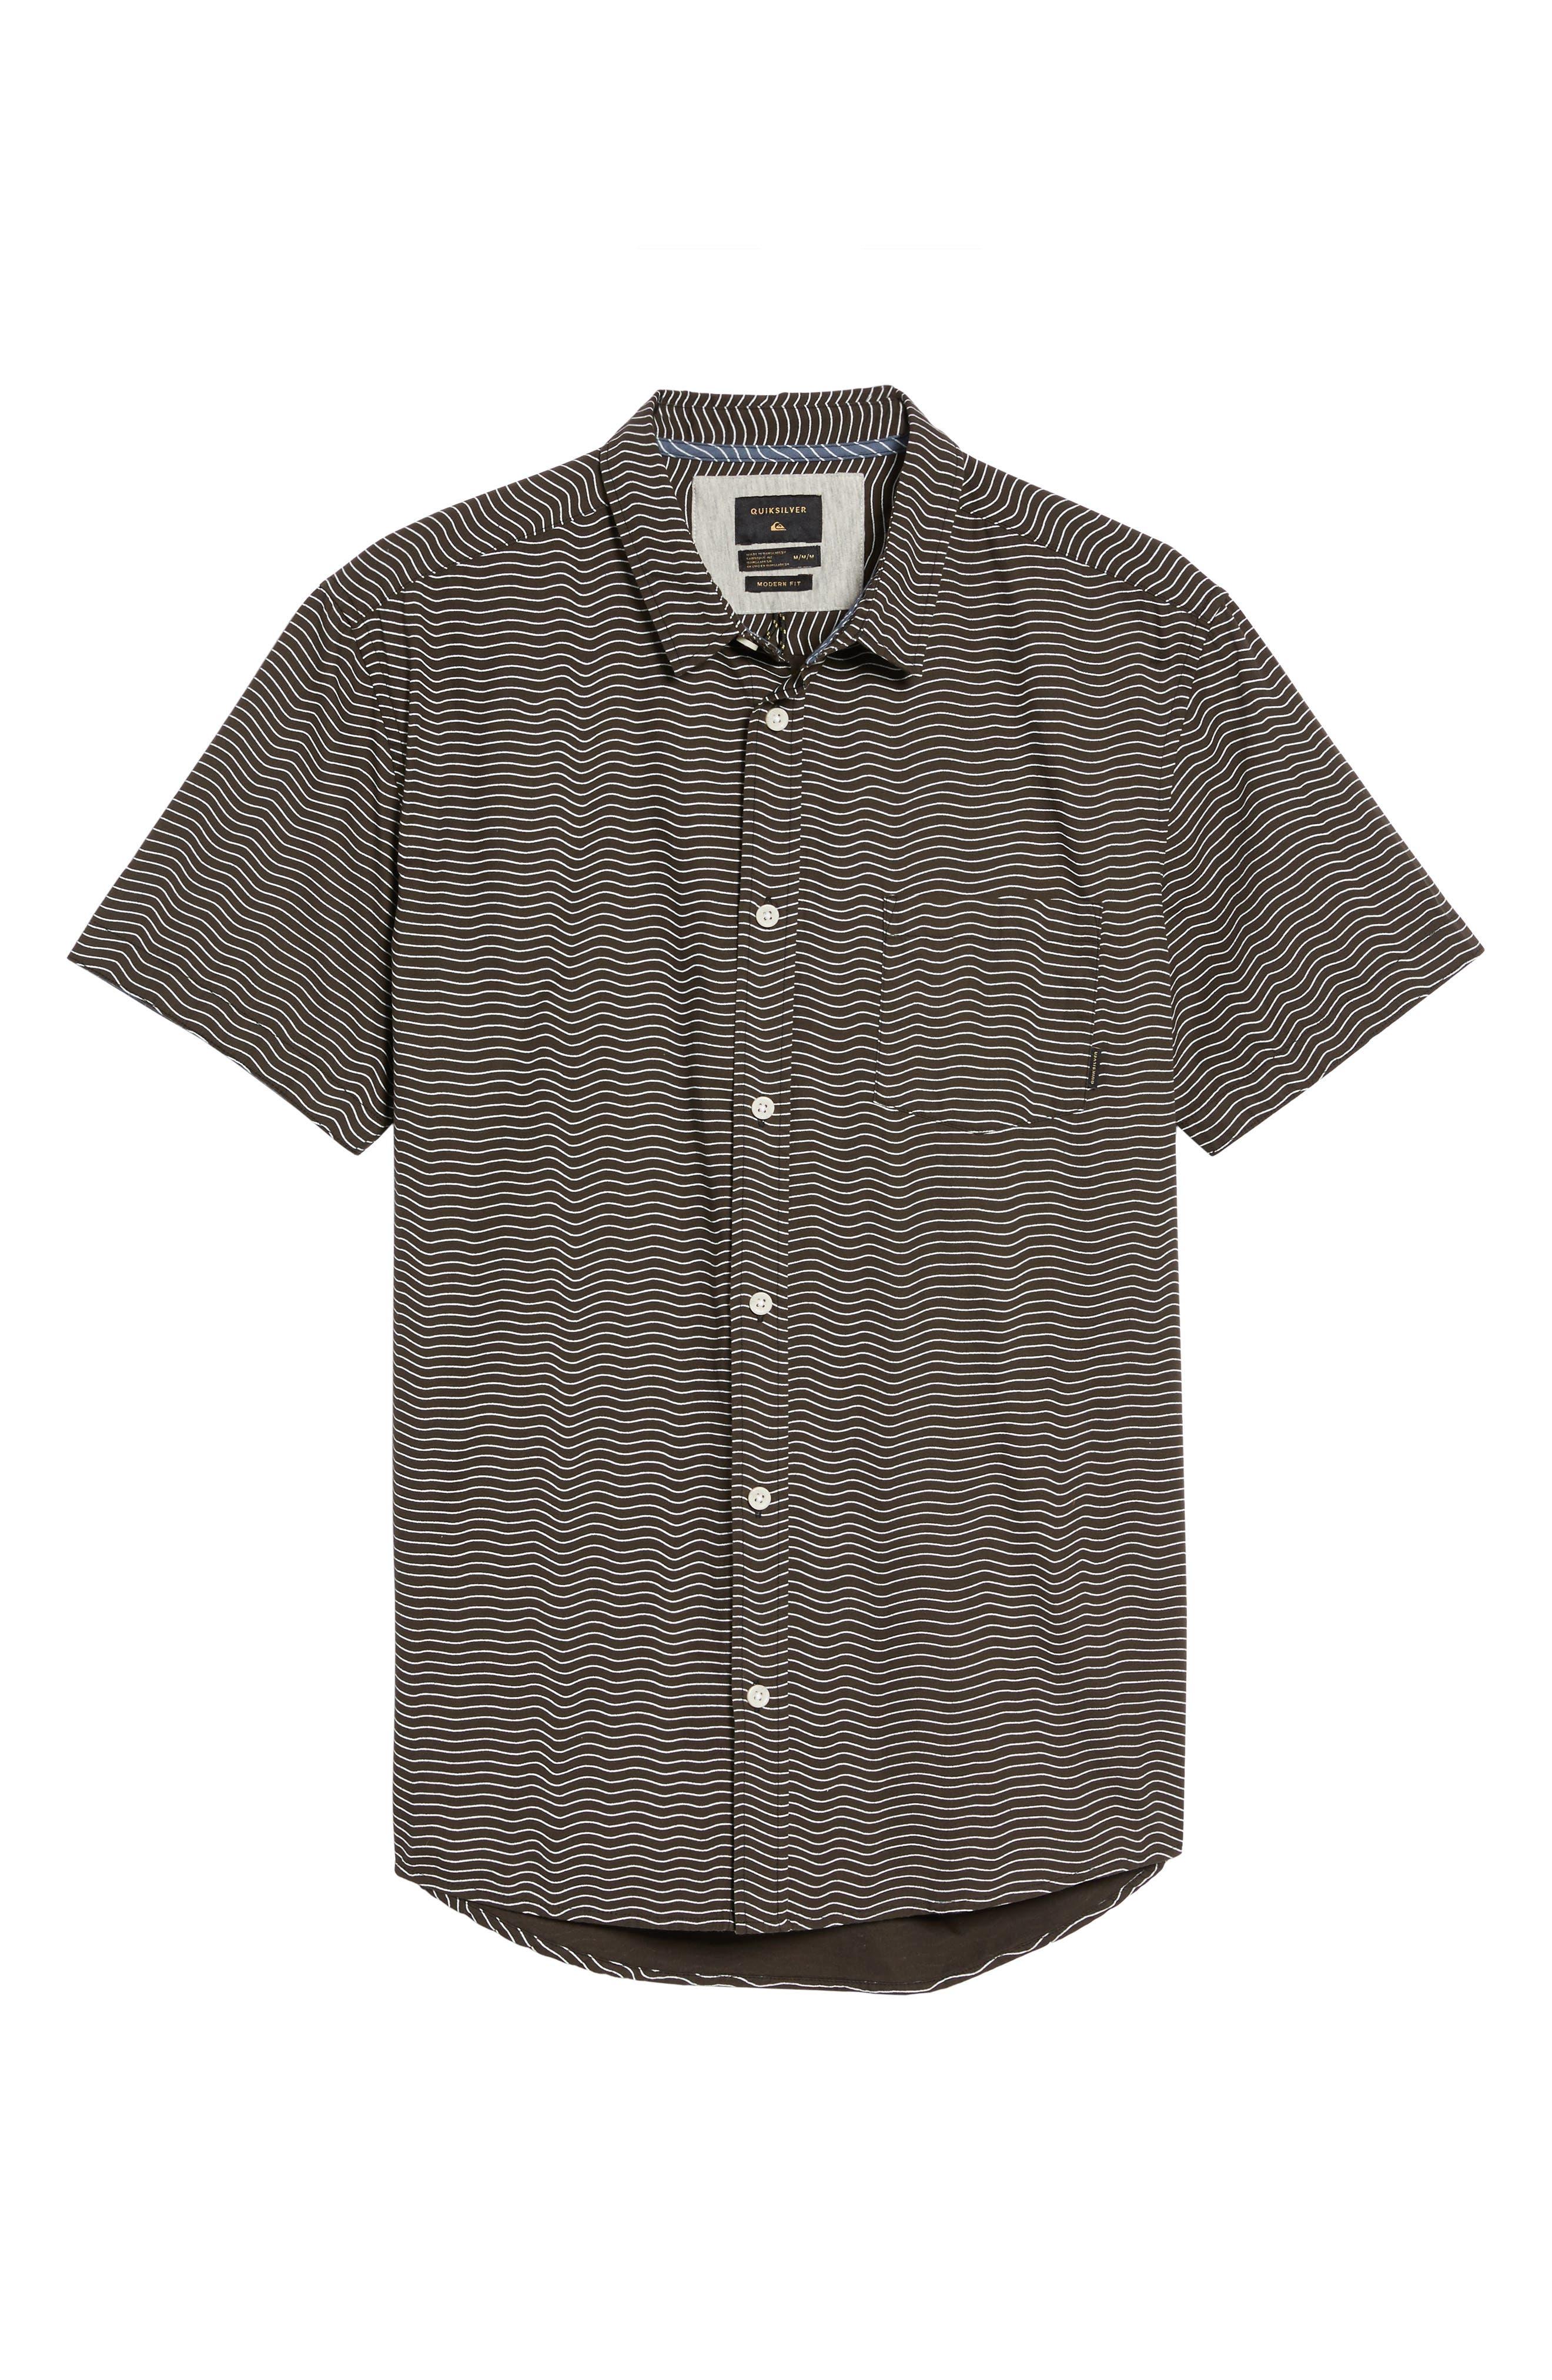 Heat Wave Stripe Shirt,                             Alternate thumbnail 6, color,                             002